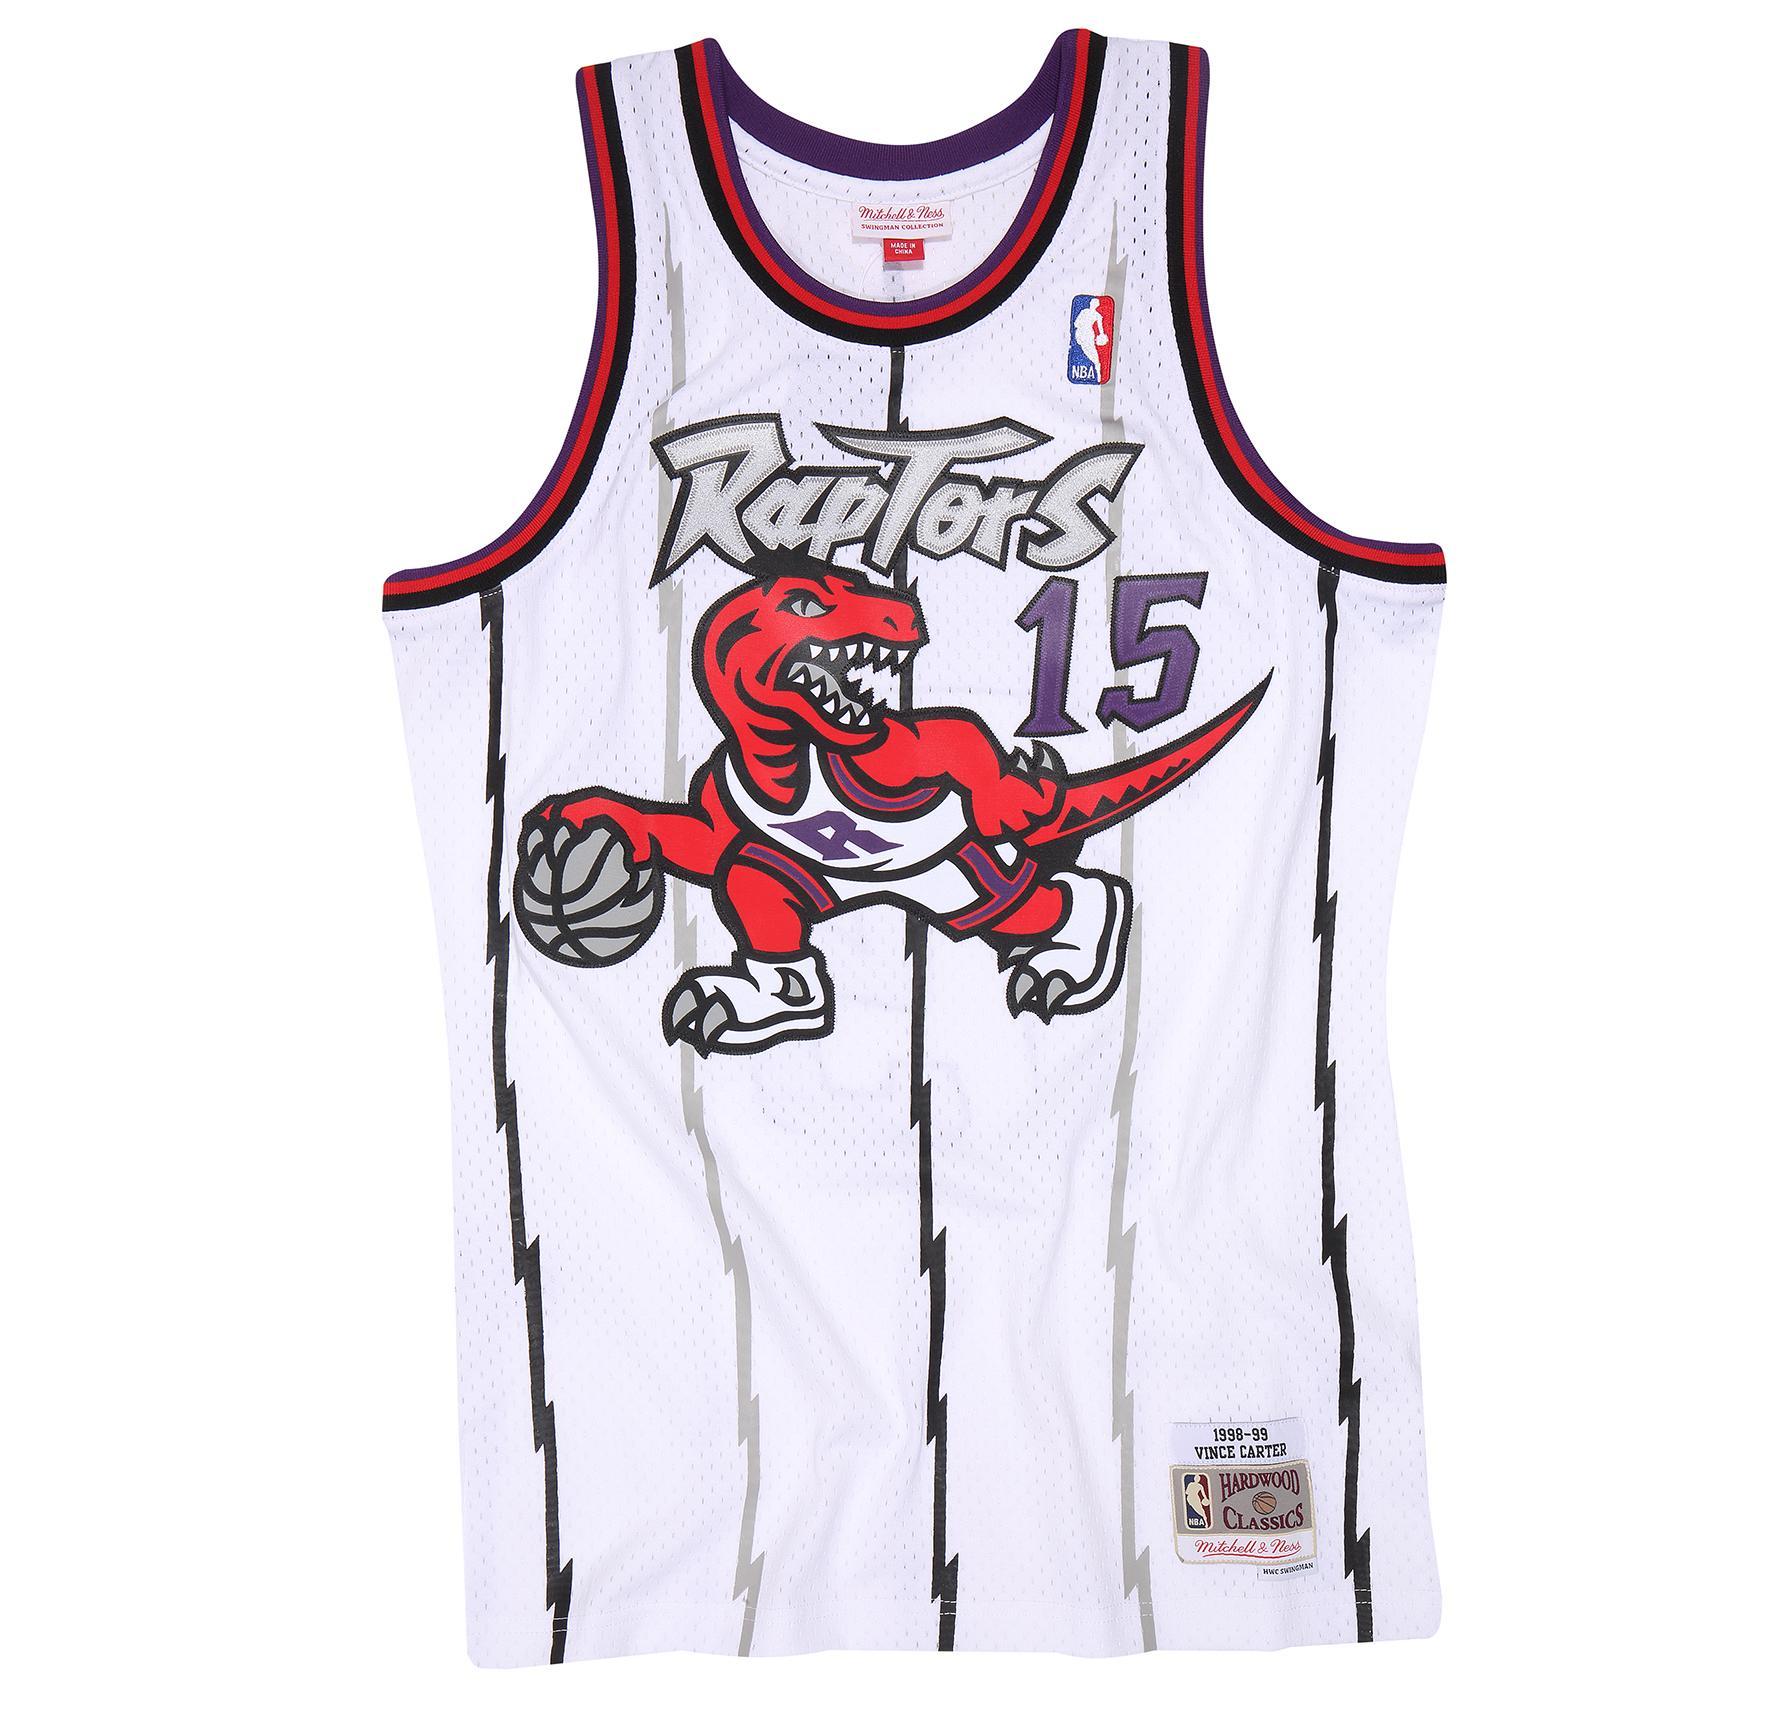 a51505f7507 Vince Carter 1998-99 Home Swingman Jersey Toronto Raptors